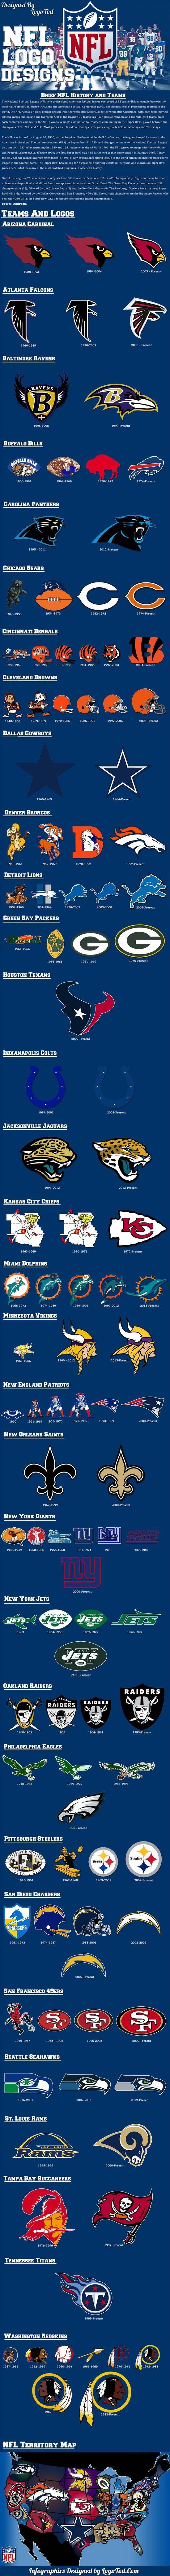 NFL Logo histories